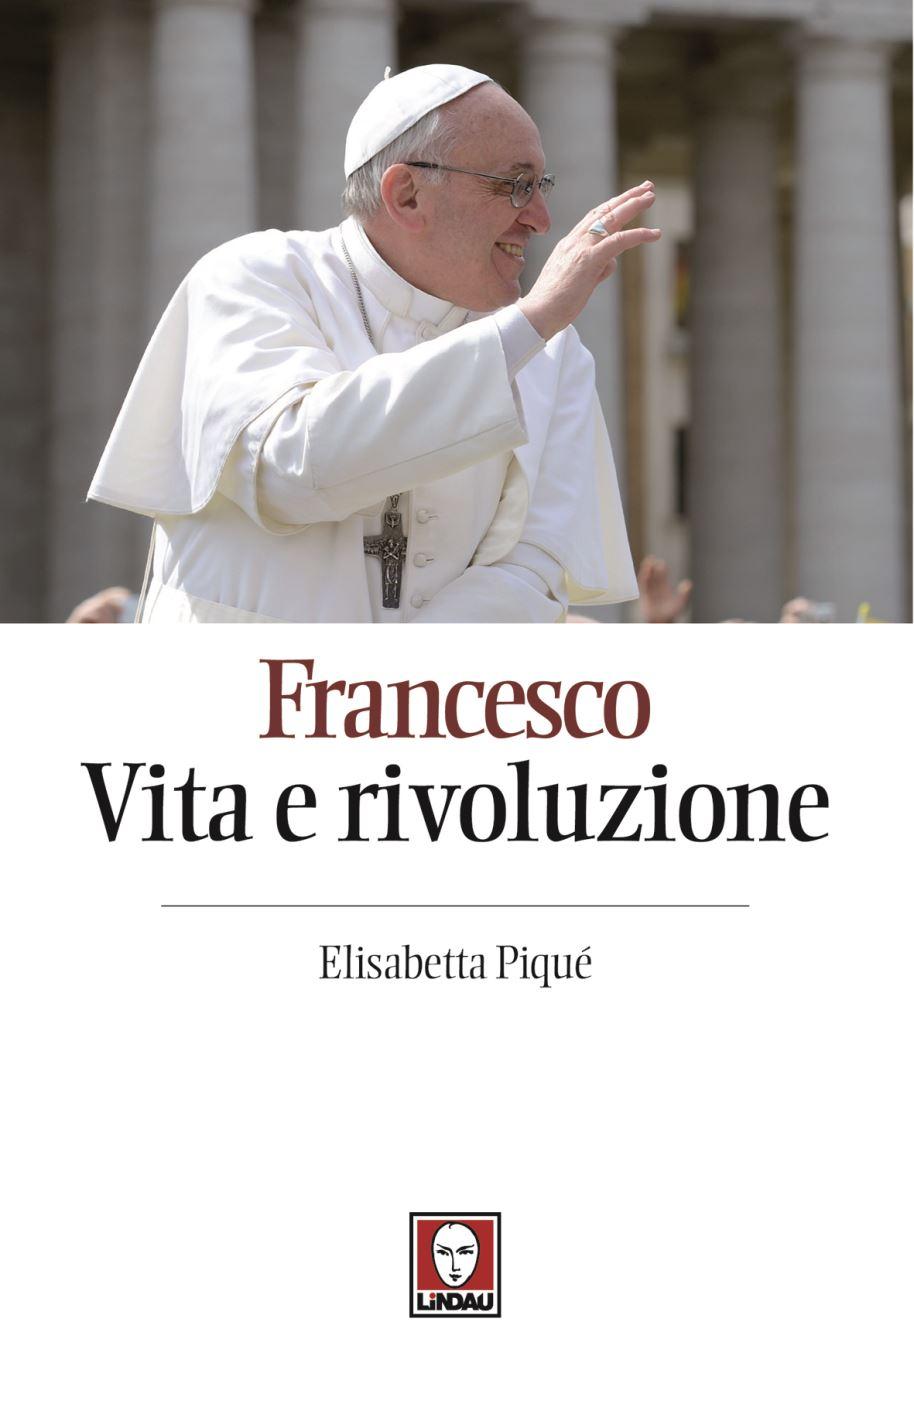 Francesco Vita E Rivoluzione Elisabetta Pique Lindau 9788867082179 Tabook